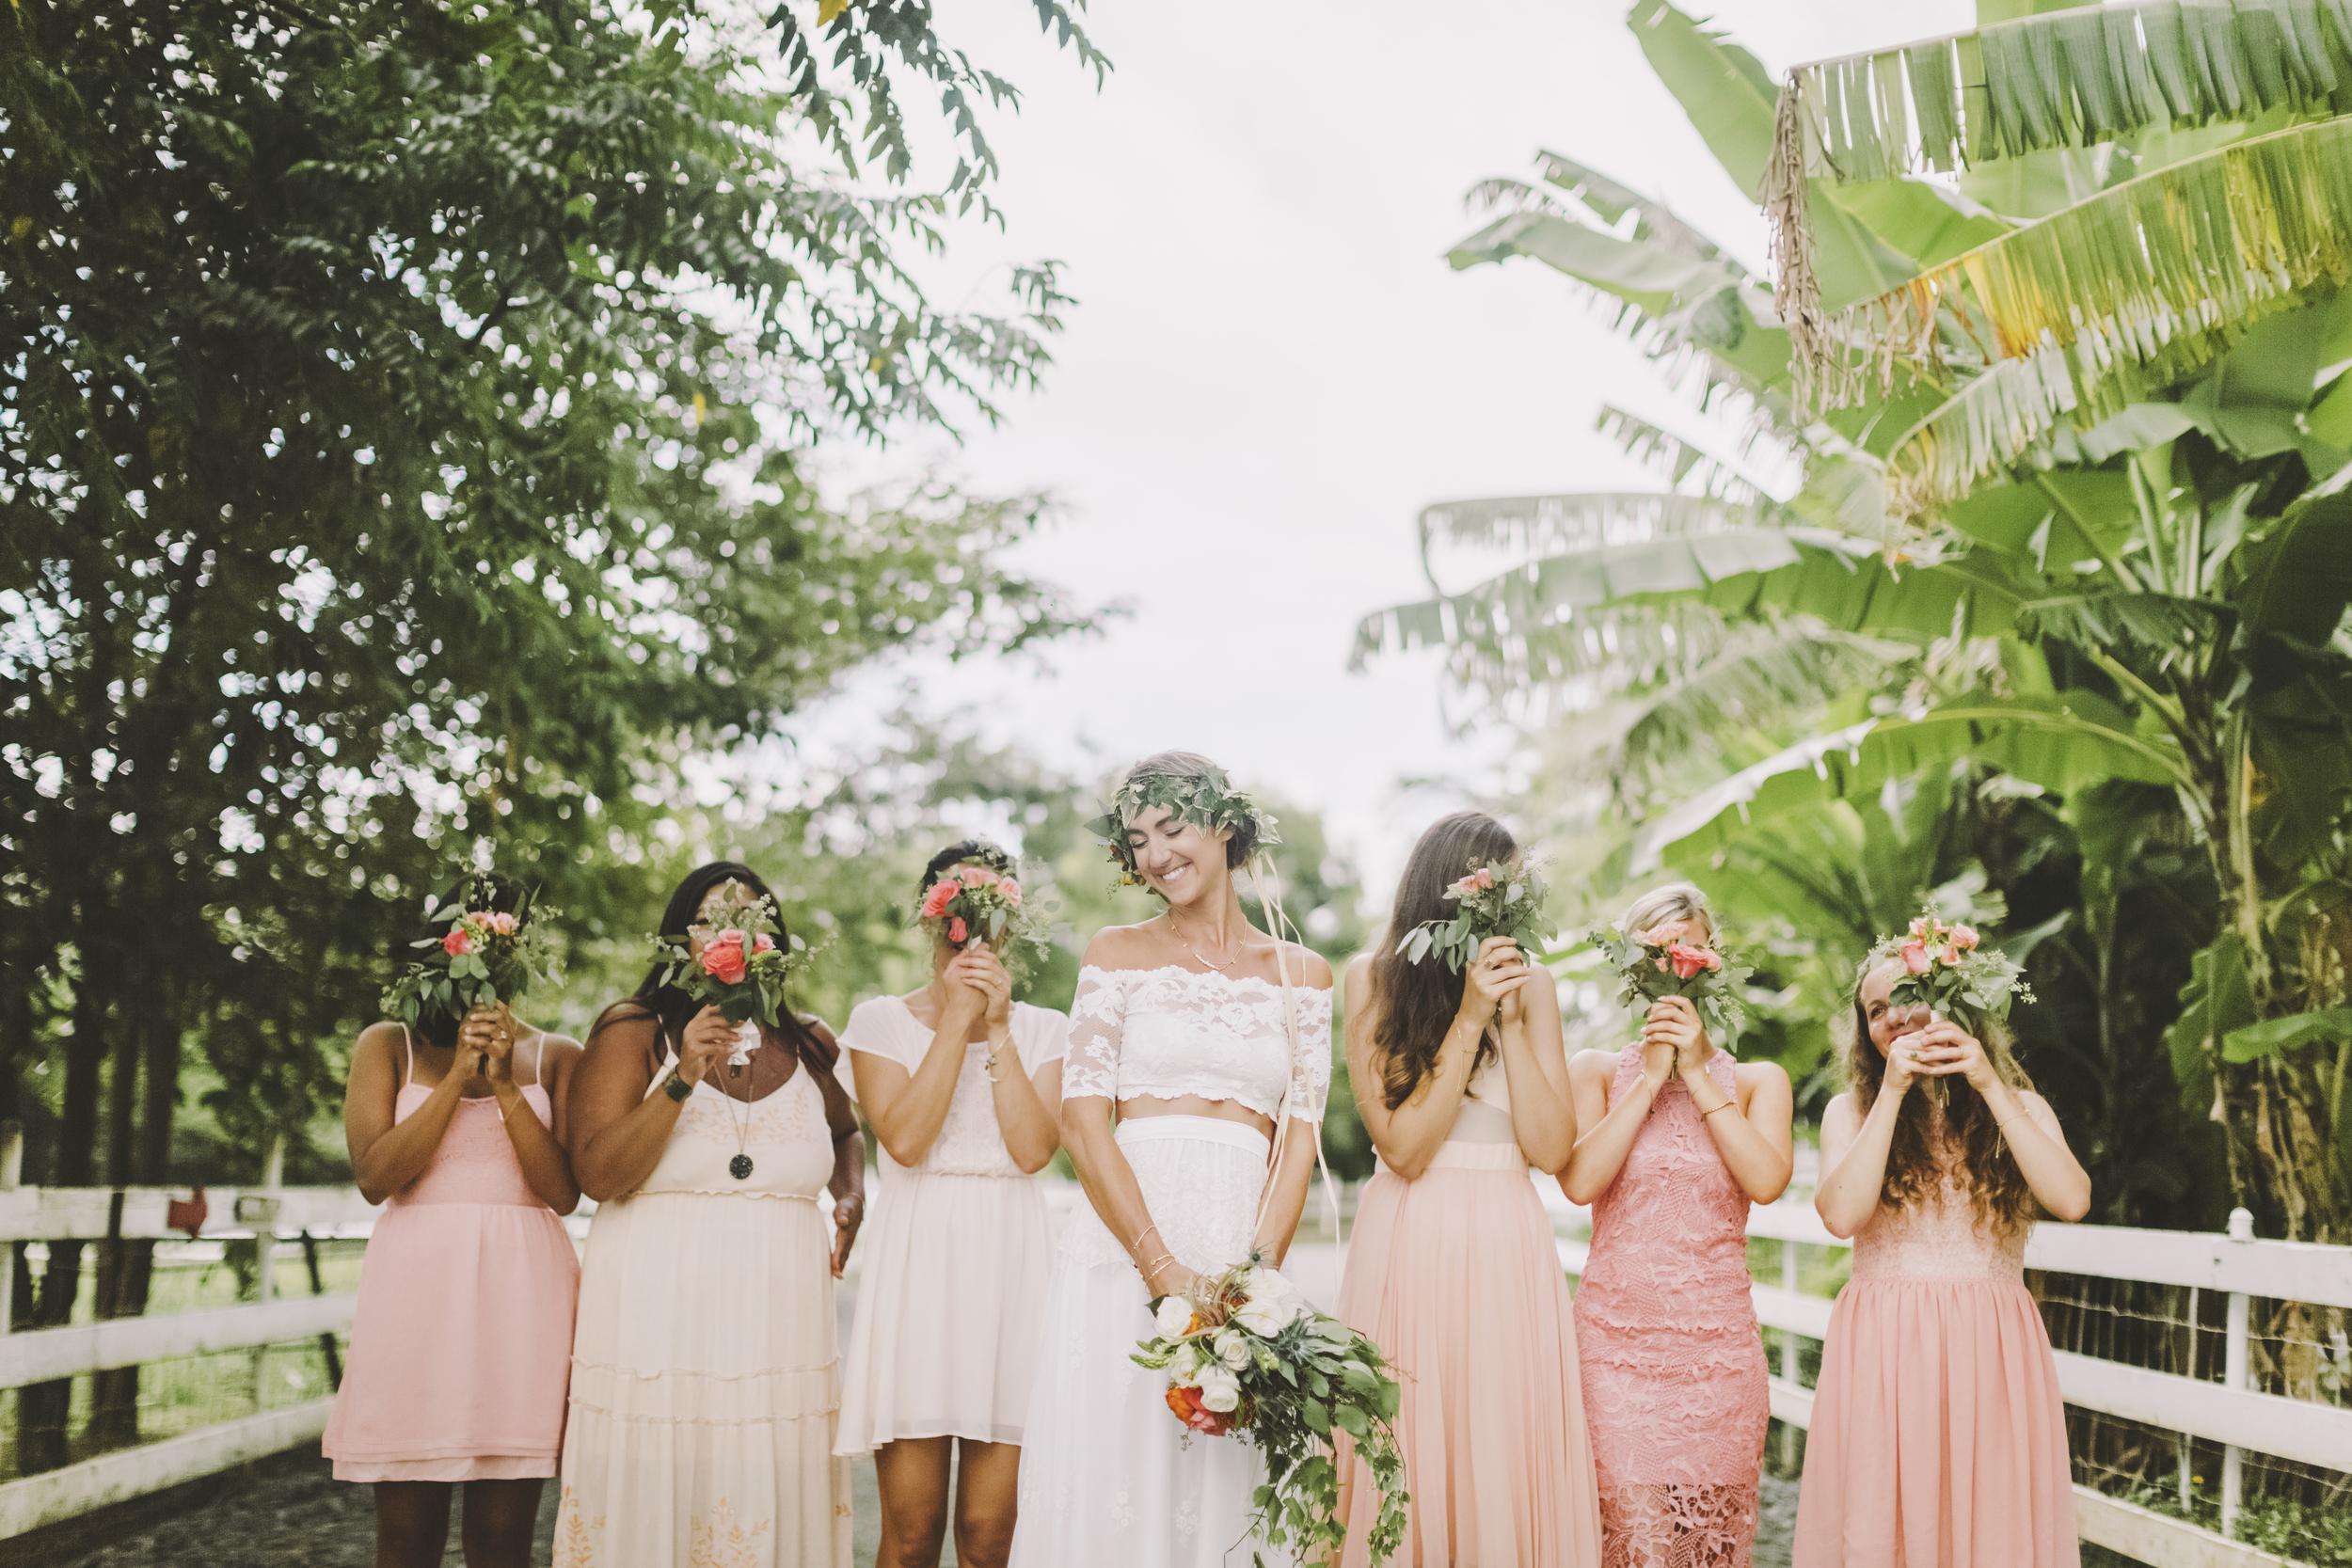 angie-diaz-photography-oahu-hawaii-wedding-tradewinds-ranch-73.jpg